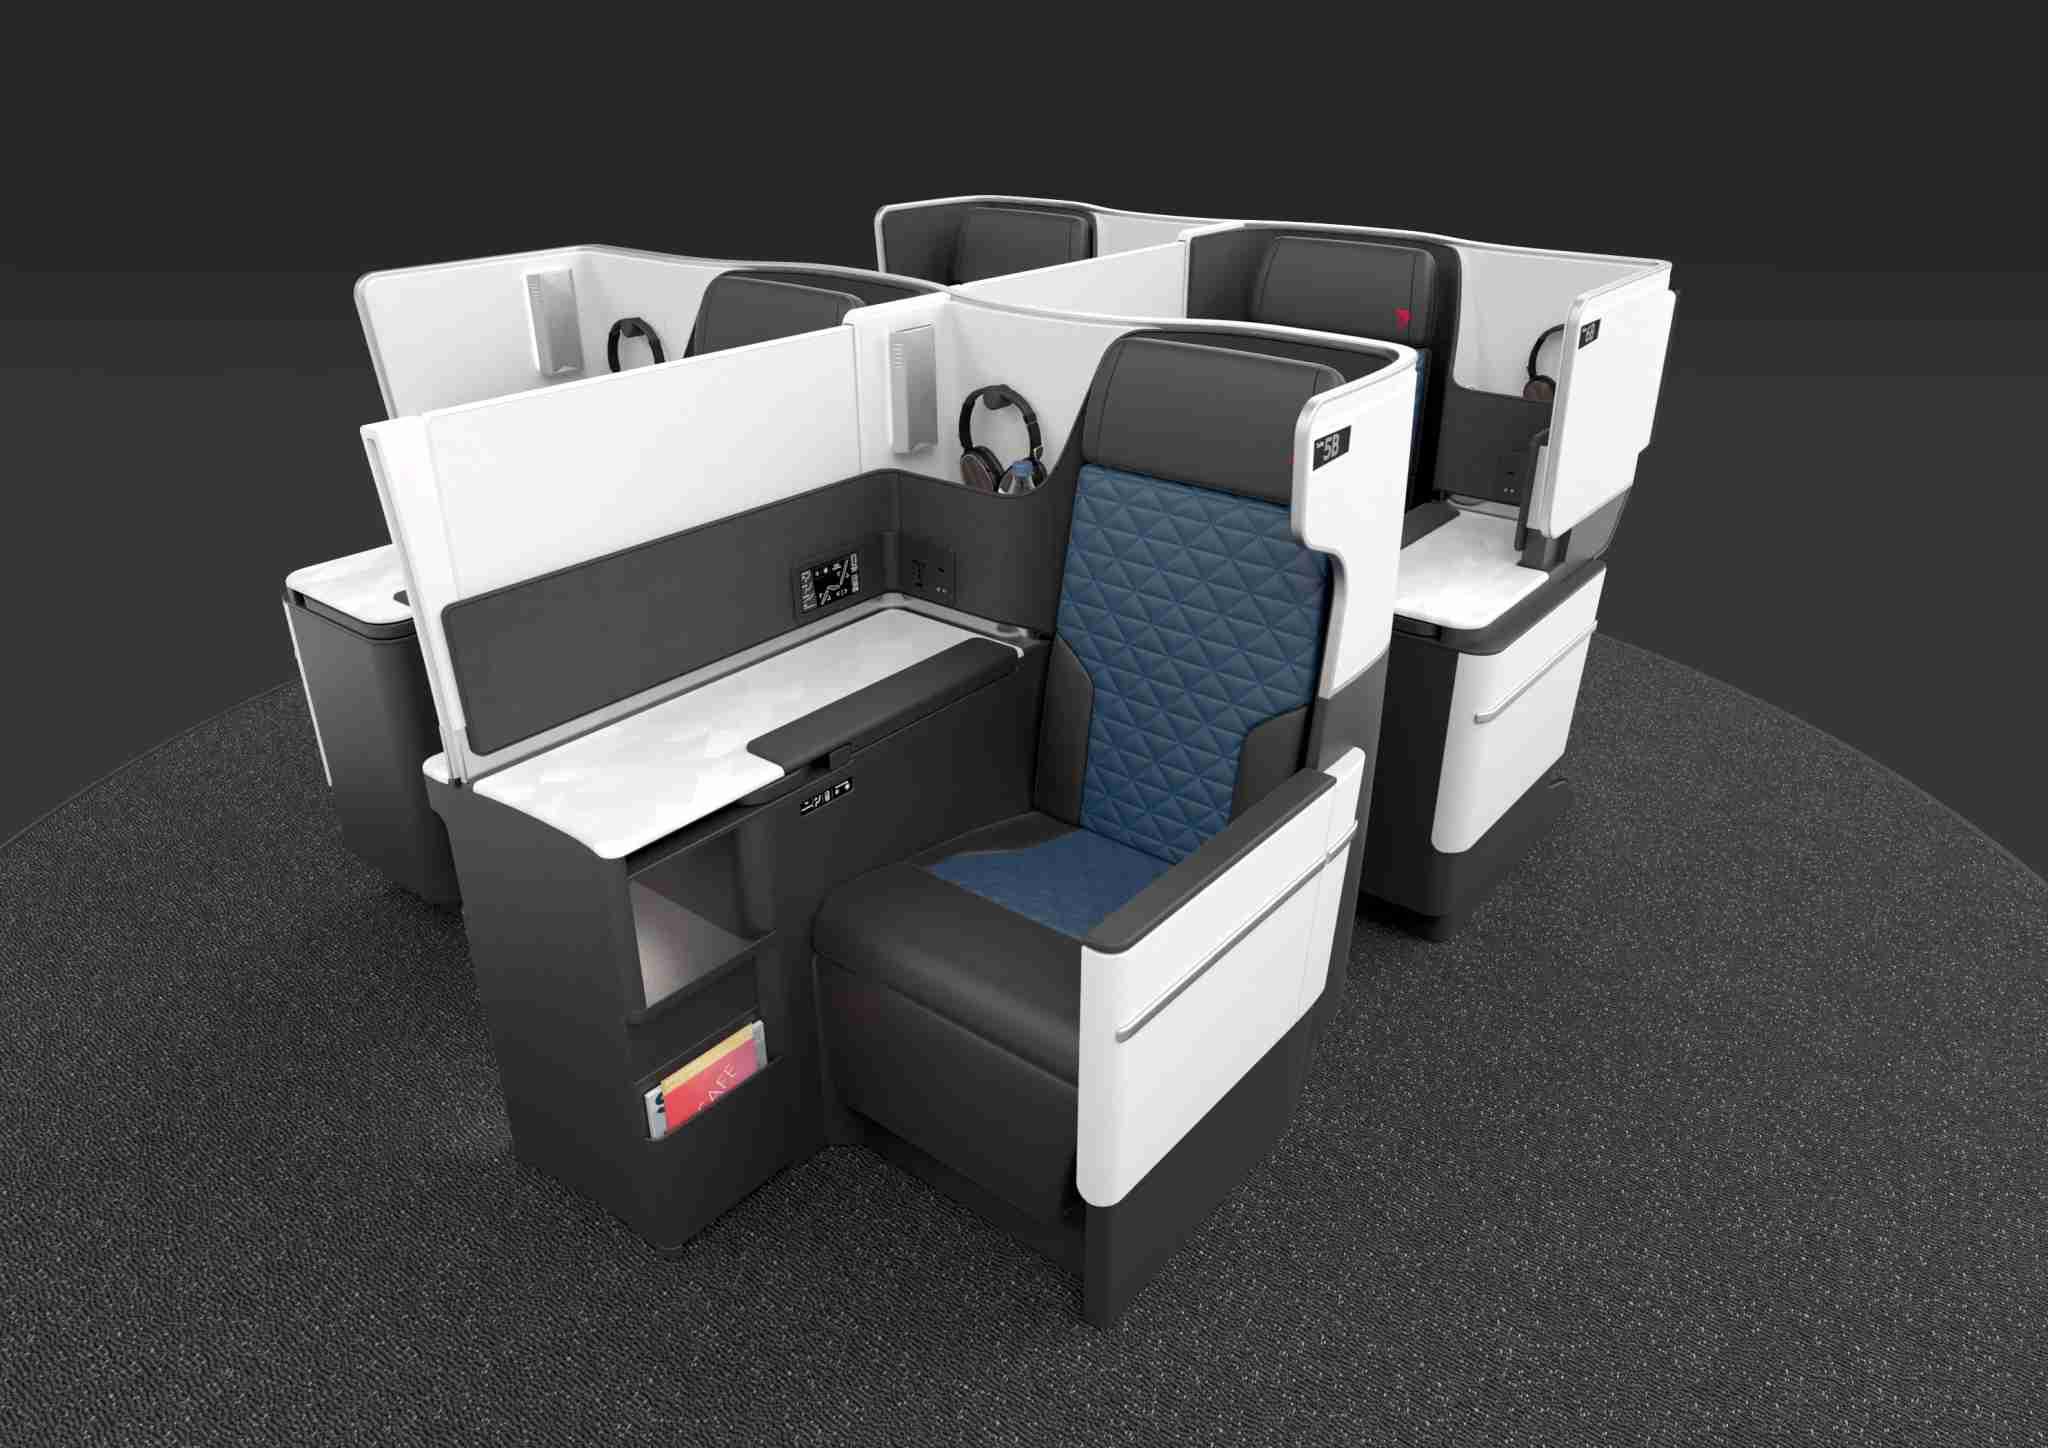 Delta-One-764-Seat-Rendering-1